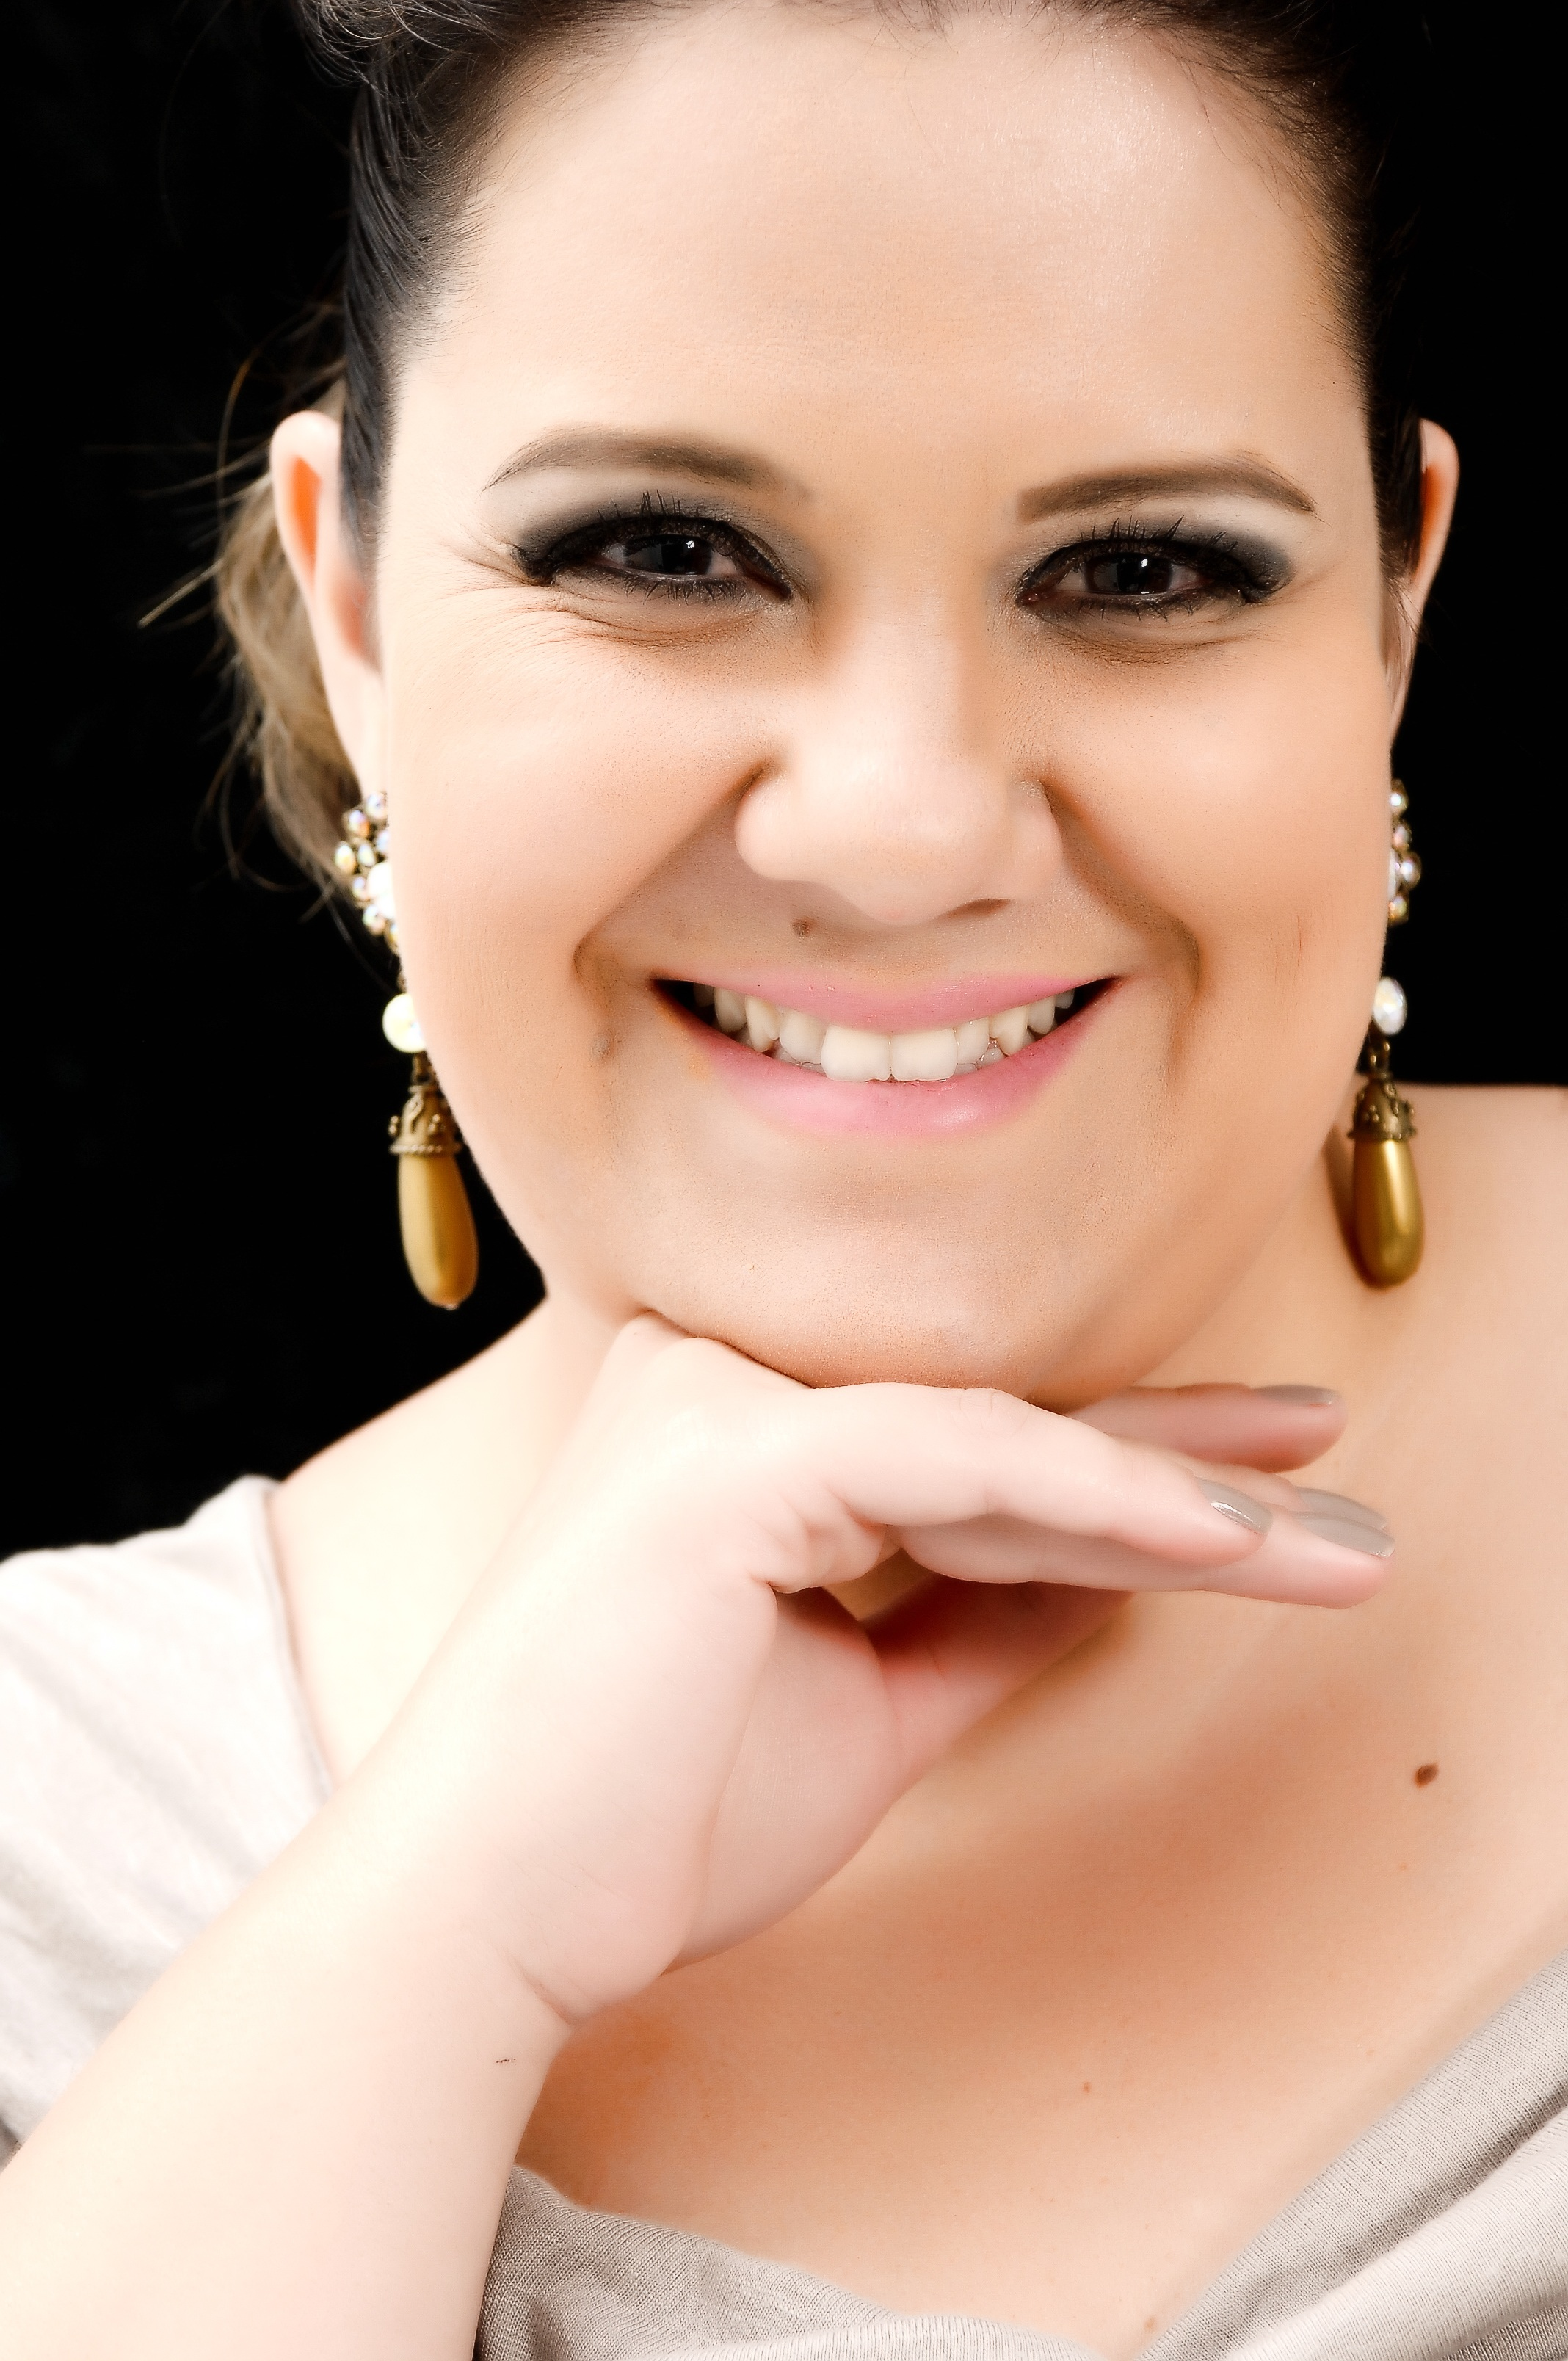 Sandra de marco black stockings threesome - 3 part 7